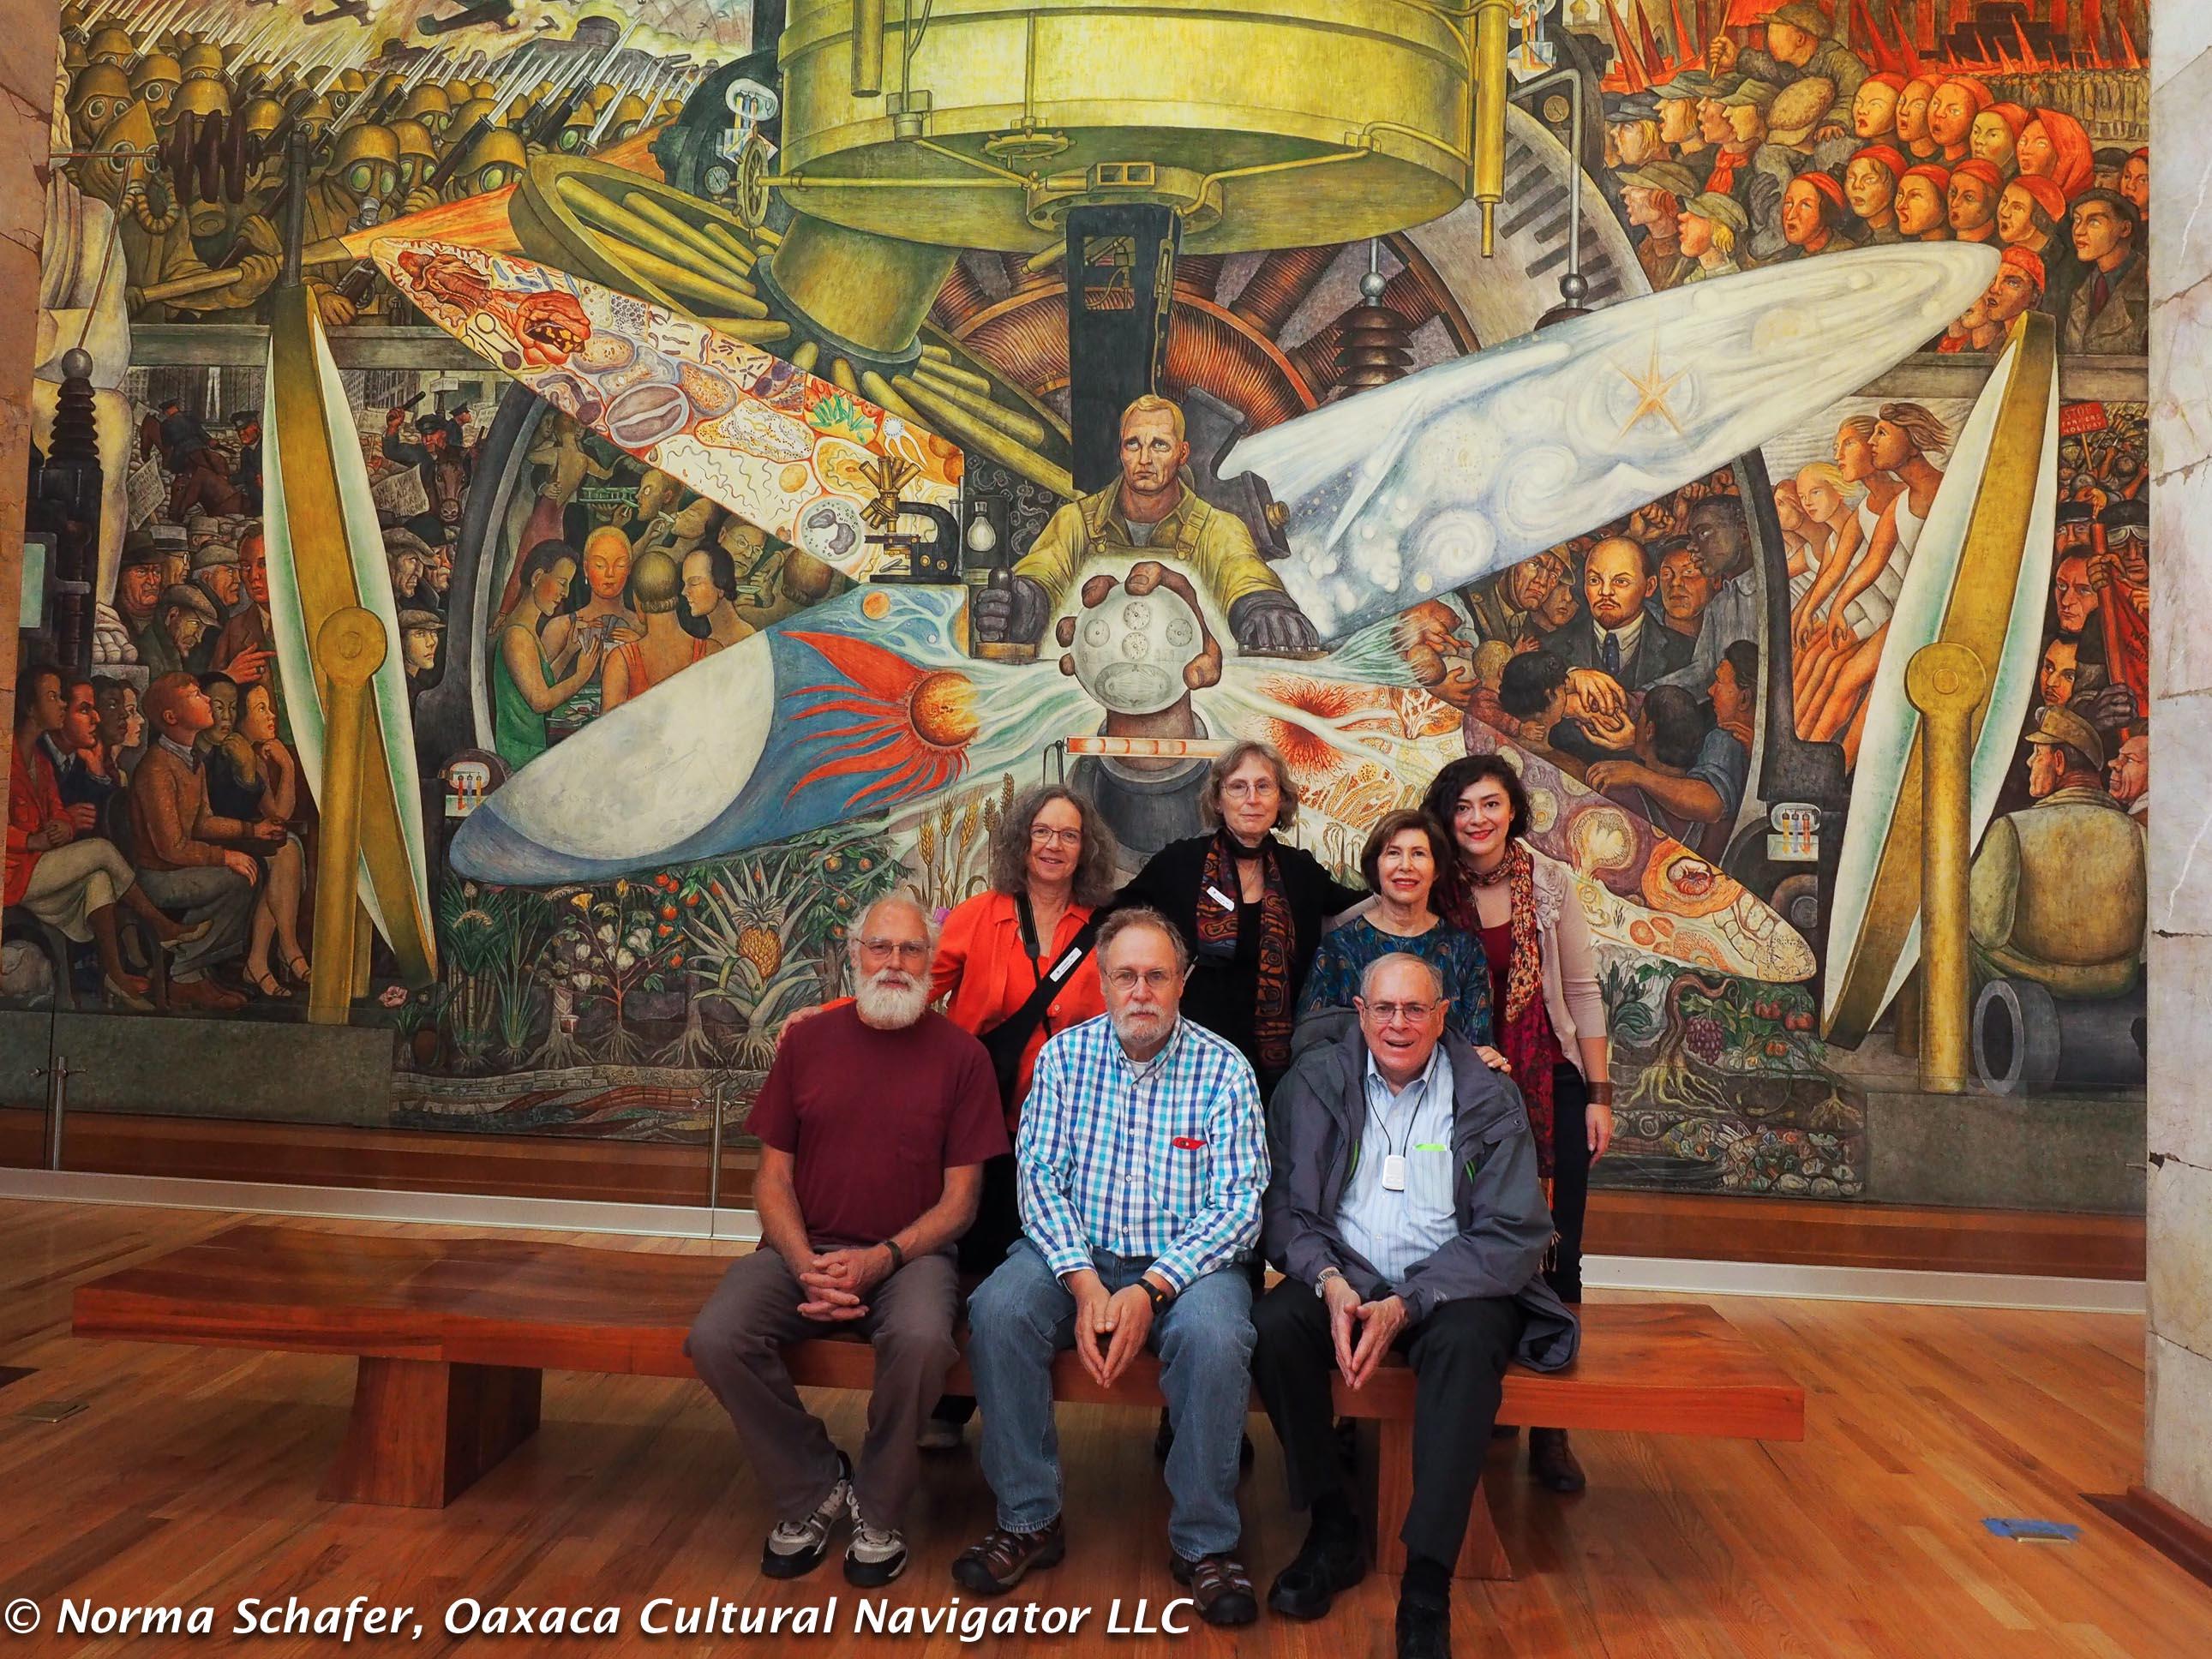 Murals oaxaca cultural navigator norma schafer for Diego rivera rockefeller center mural